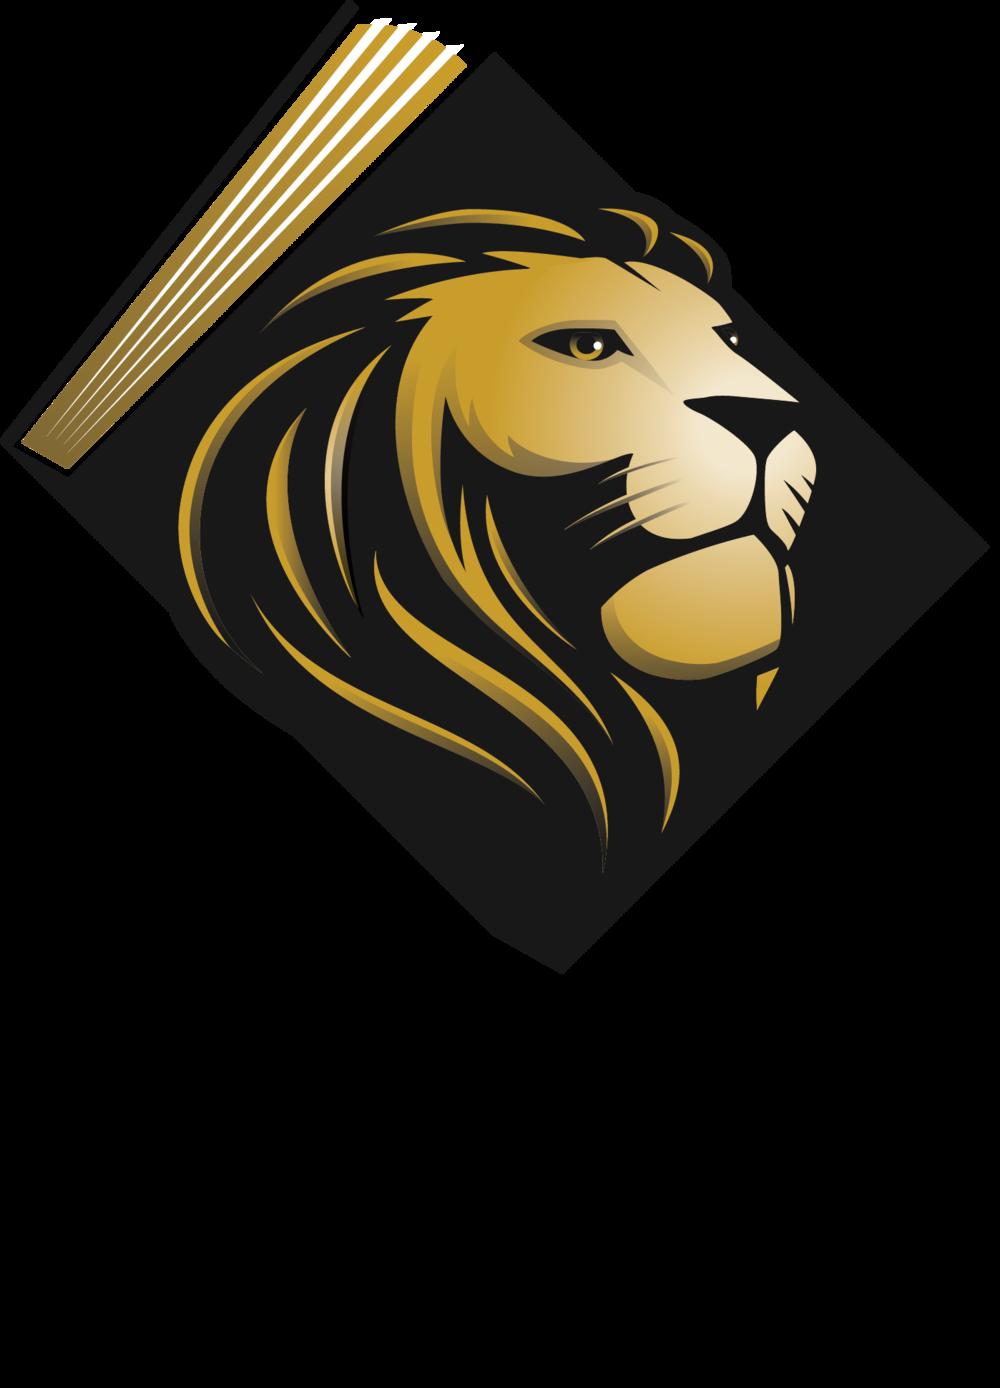 LionsofLiterature_1_winner.png